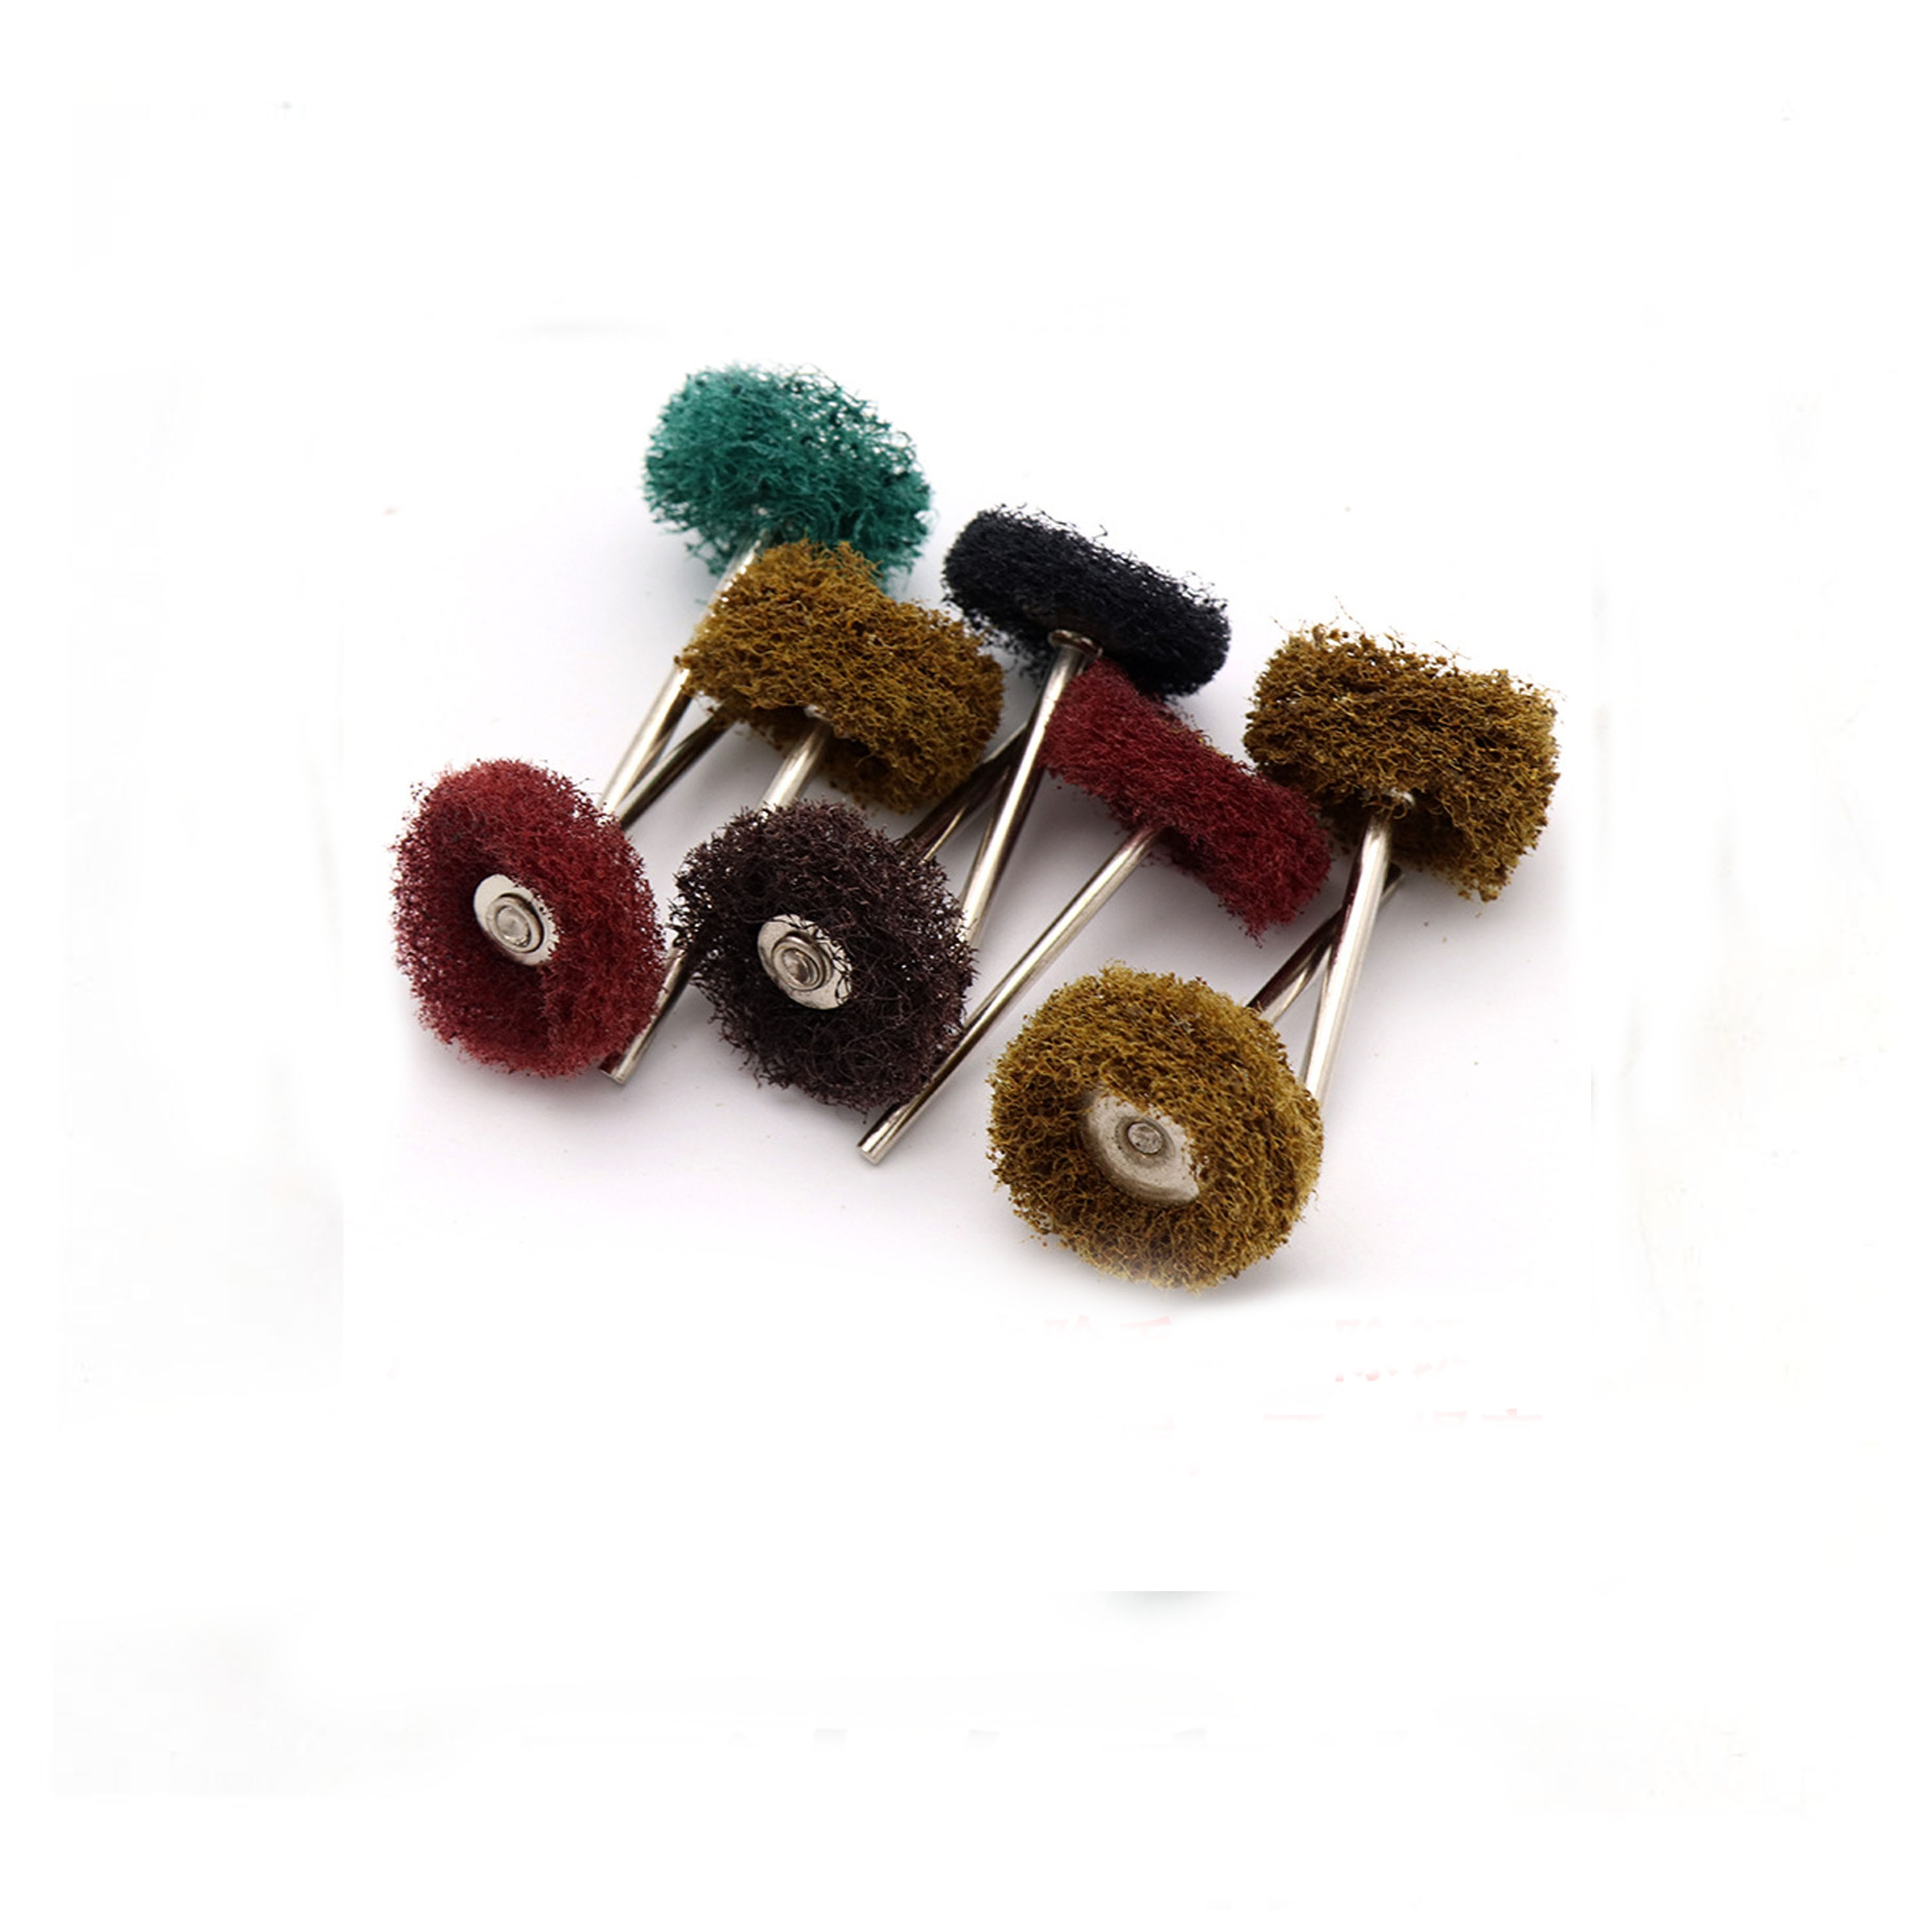 100 pçs almofada de limpeza polighing rodas náilon firber moagem ferramentas abrasivas para jóias 3mm haste